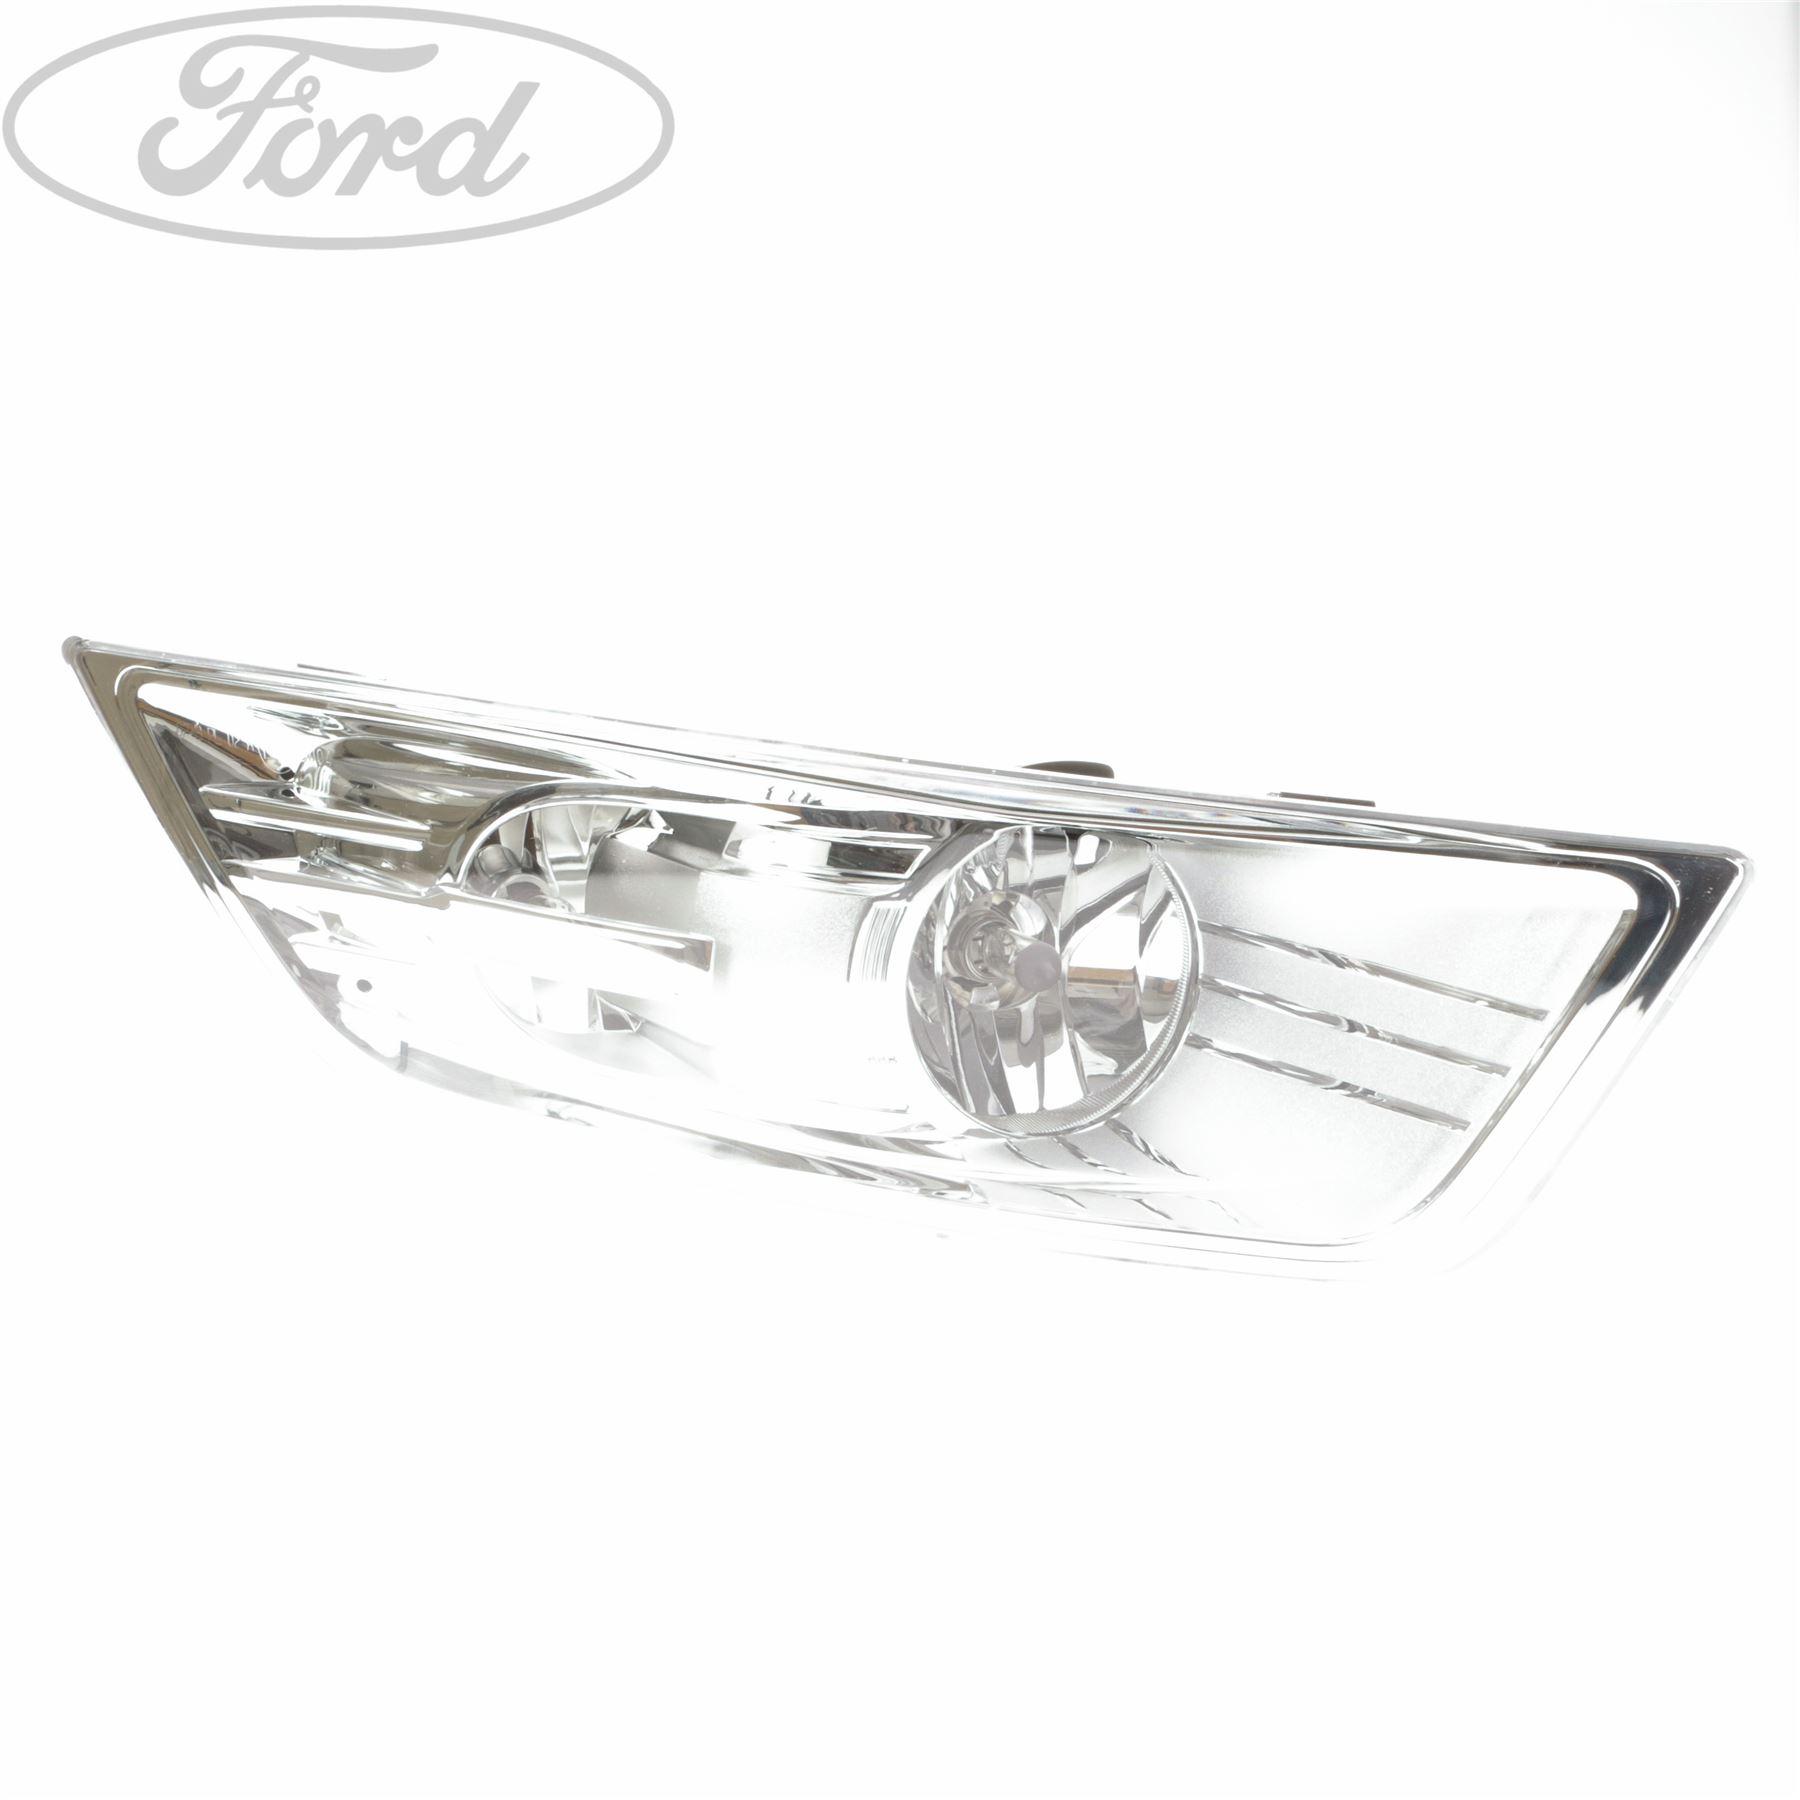 Genuine Ford Galaxy WA6 Front O/S Fog Light Lamp 1694704